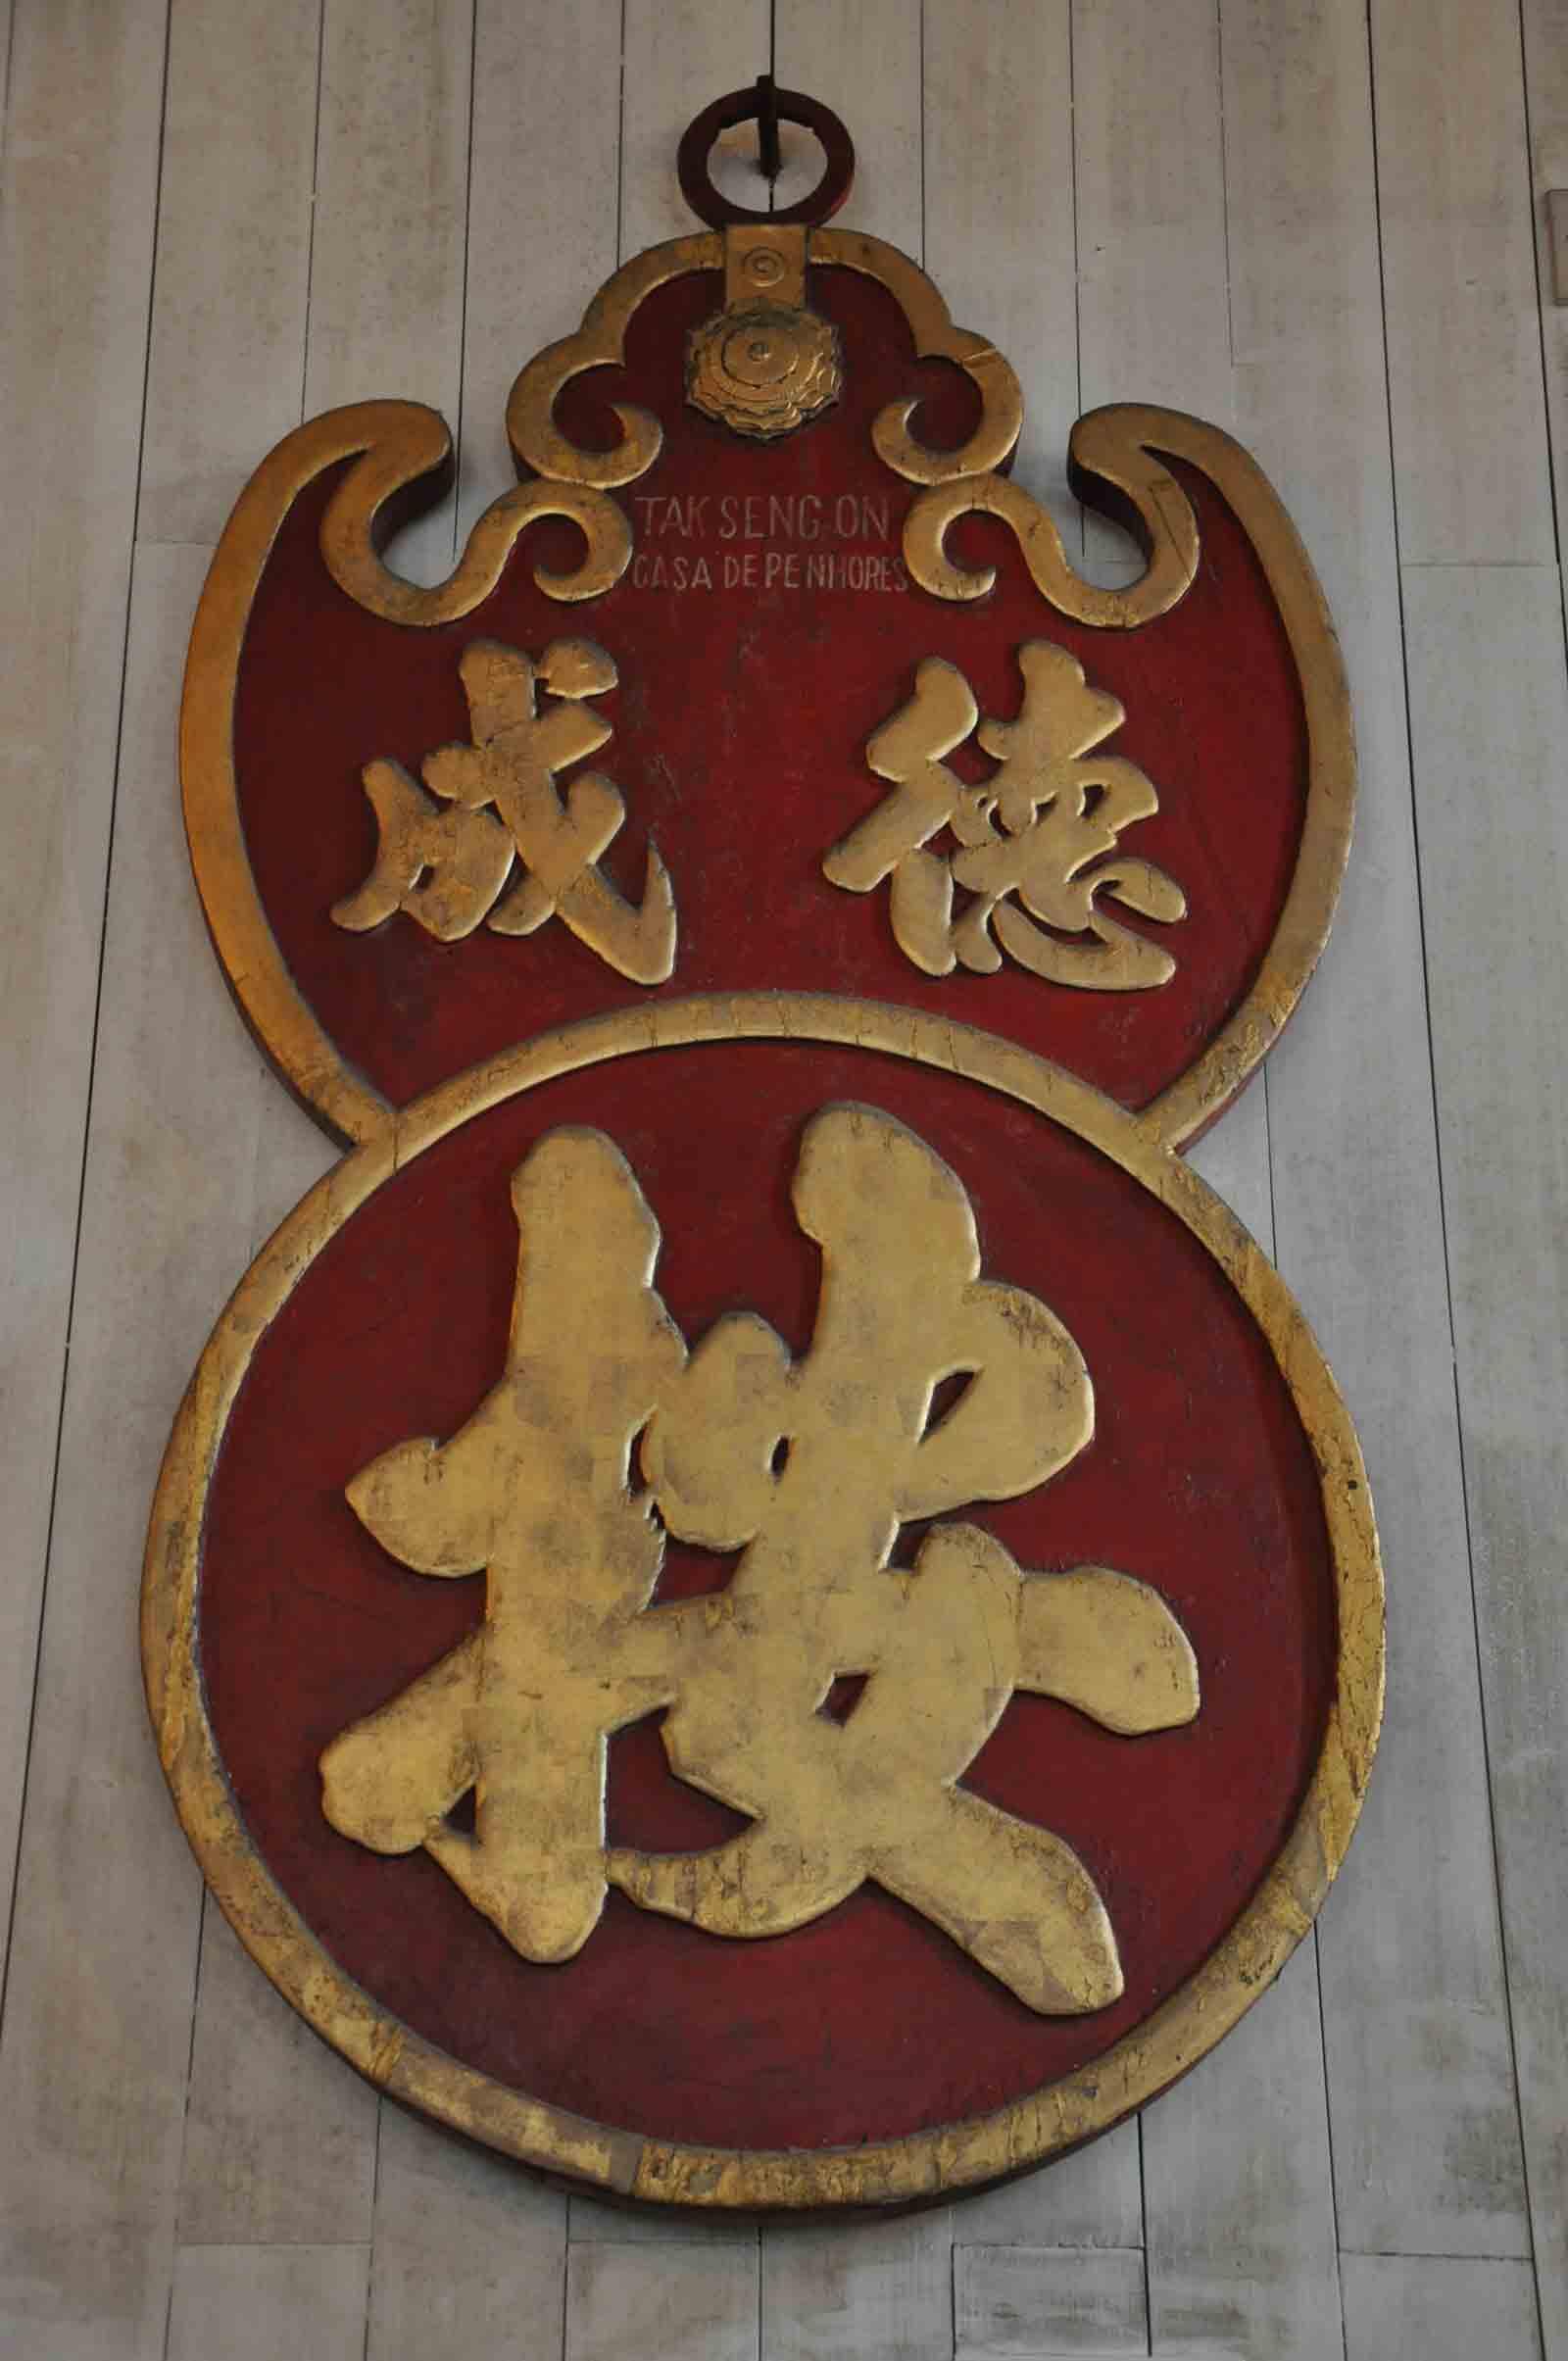 Tak Sang On Pawnshop bat and coin pawn shop symbol